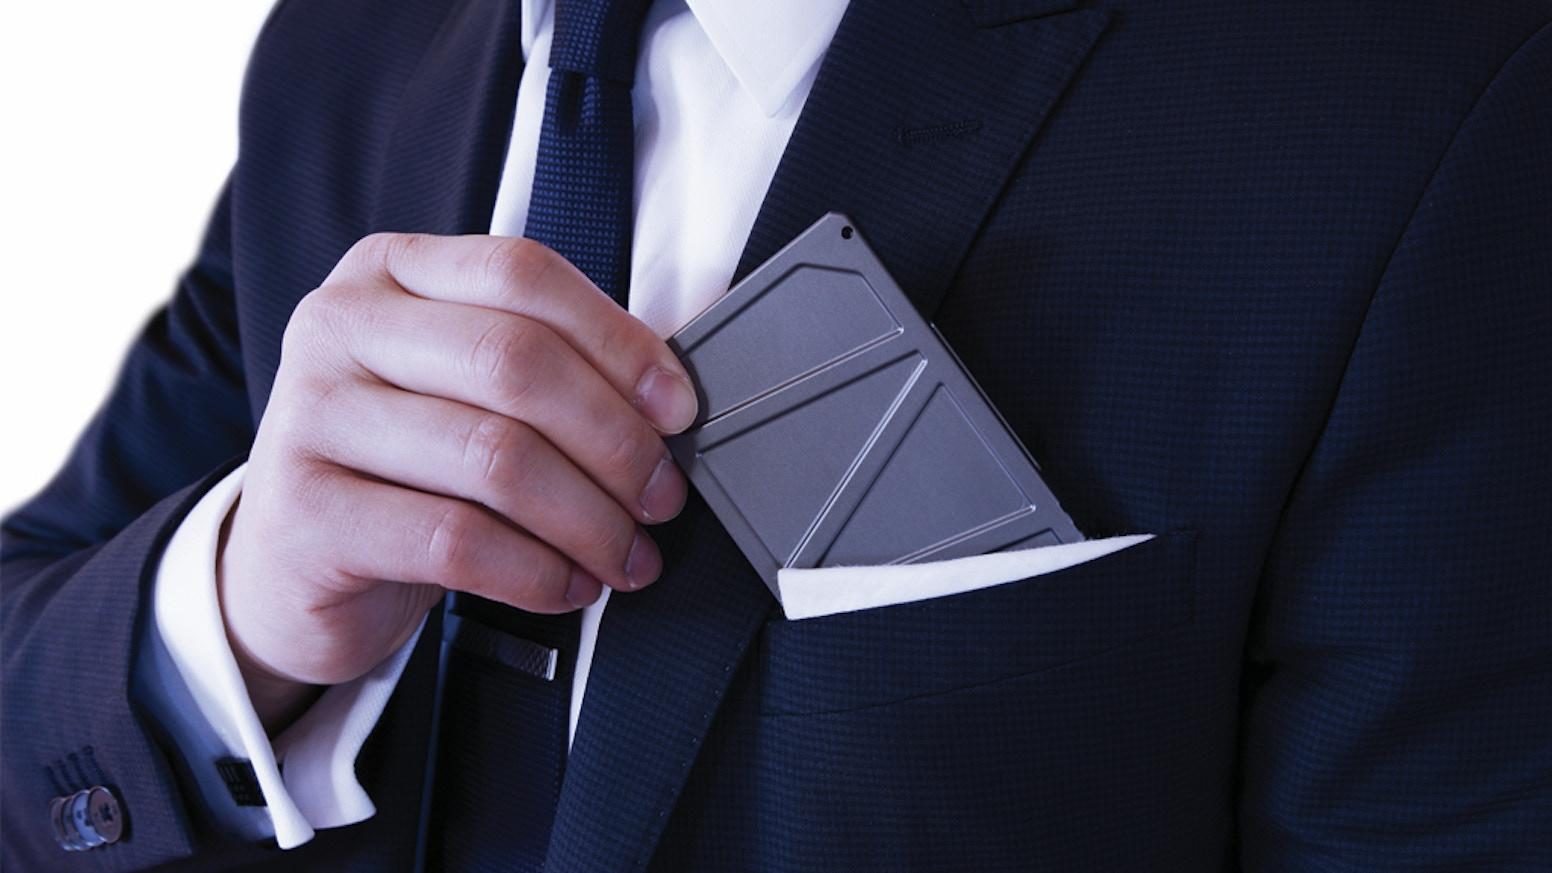 Titan A Gentlemans Business Card Holder Minimalist Wallet By